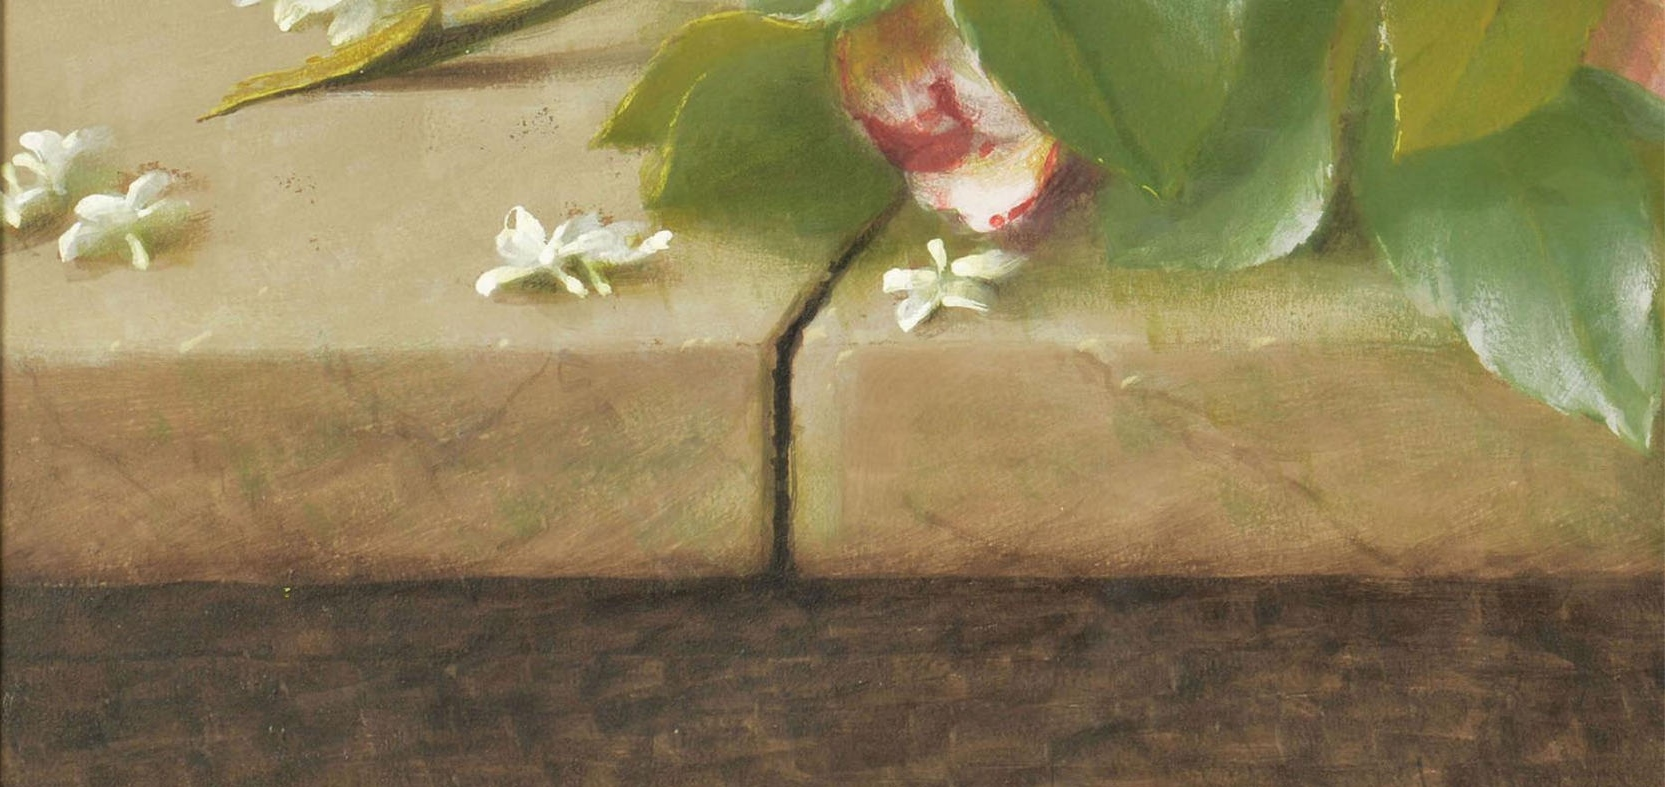 Lot 3088159: Raoul De Longpre Floral Still Life Painting